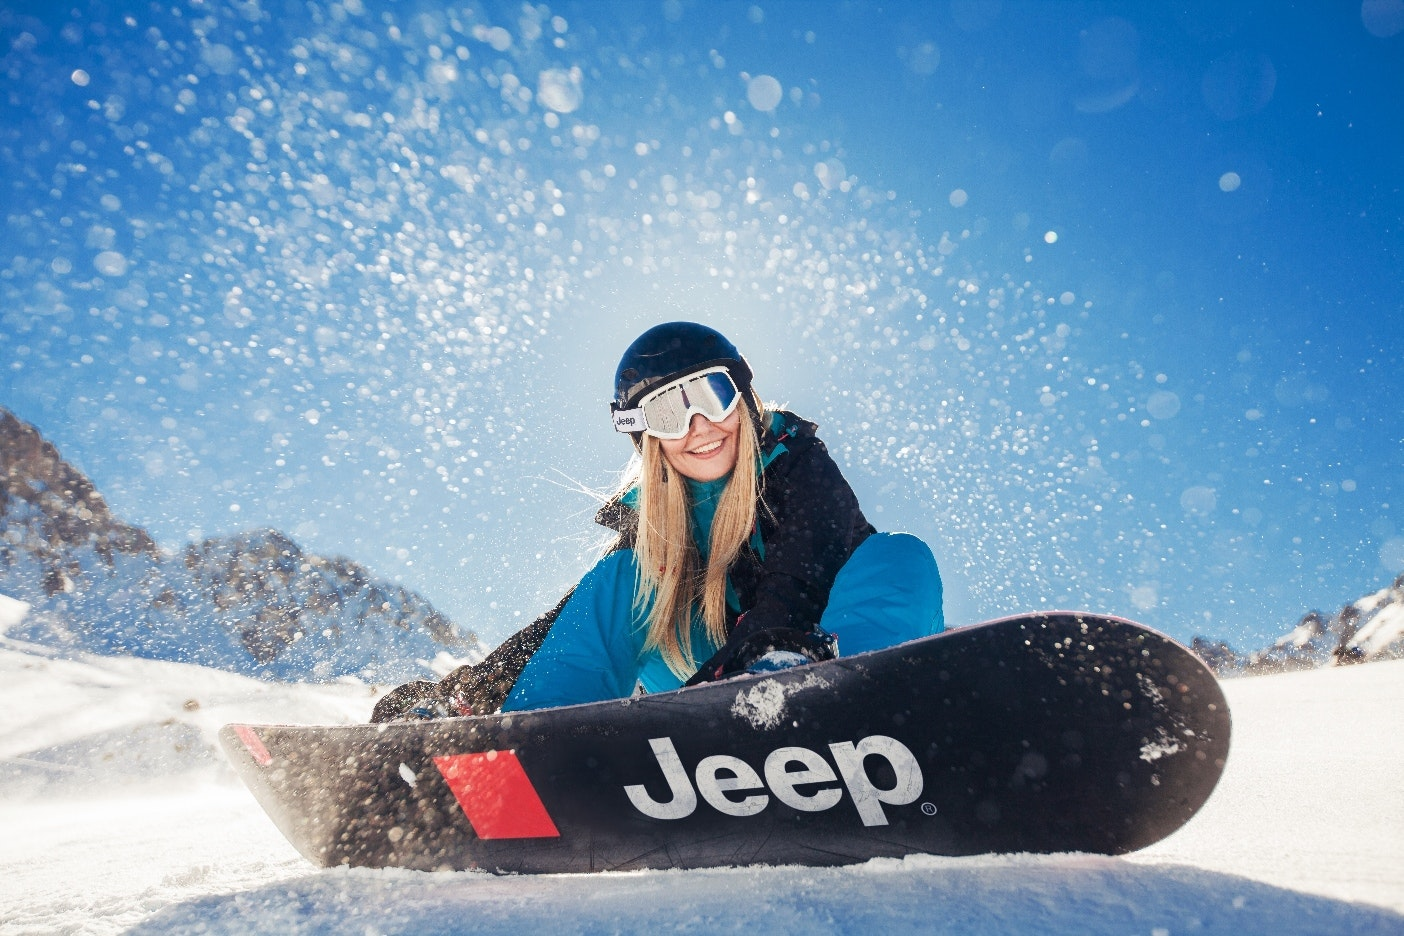 Jeep snowboarder 251705977